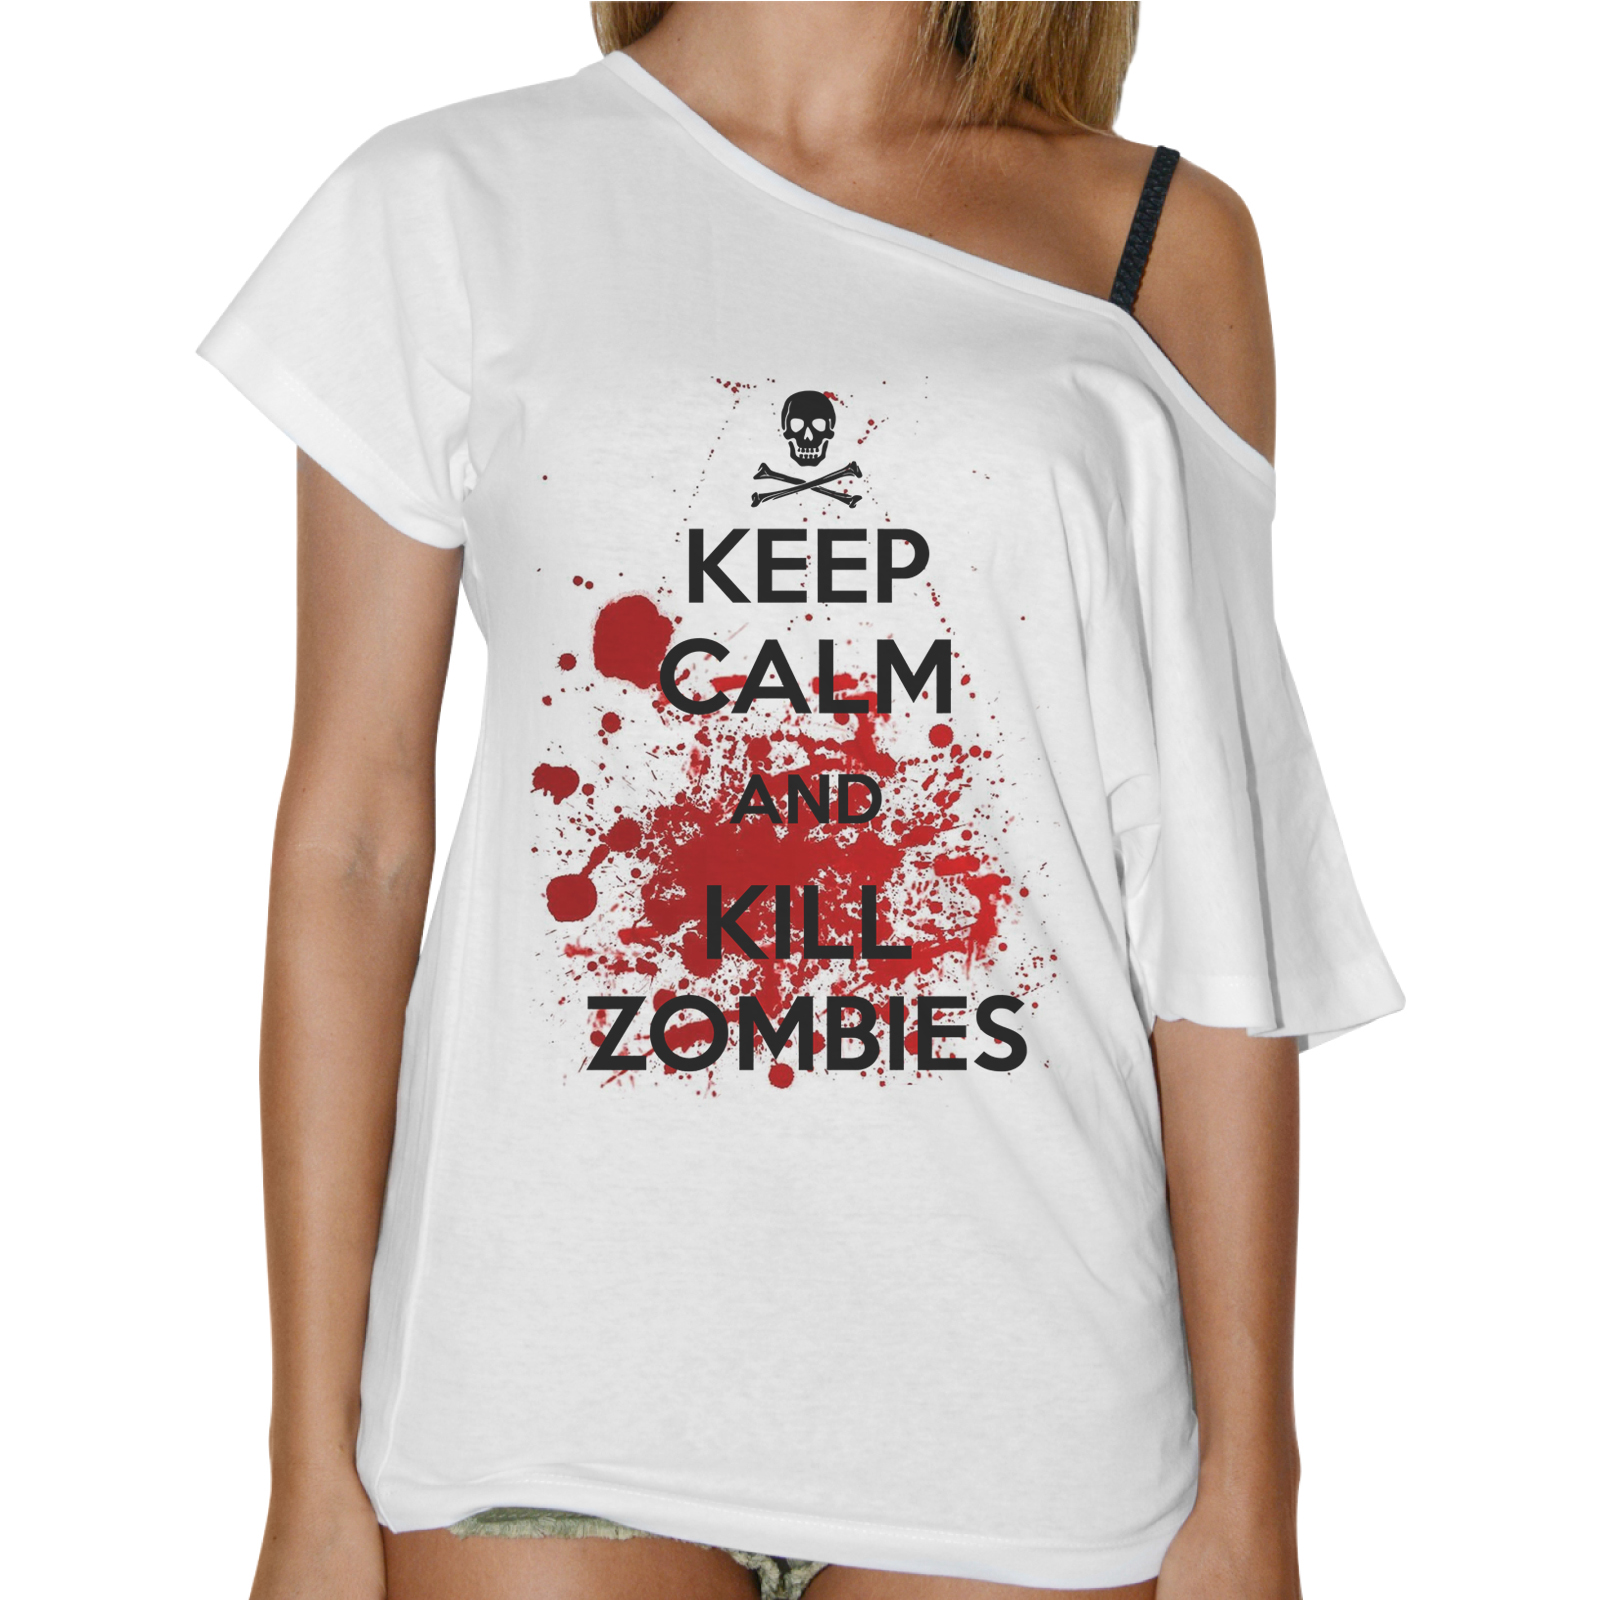 T-Shirt Donna Collo Barca KEEP ZOMBIE